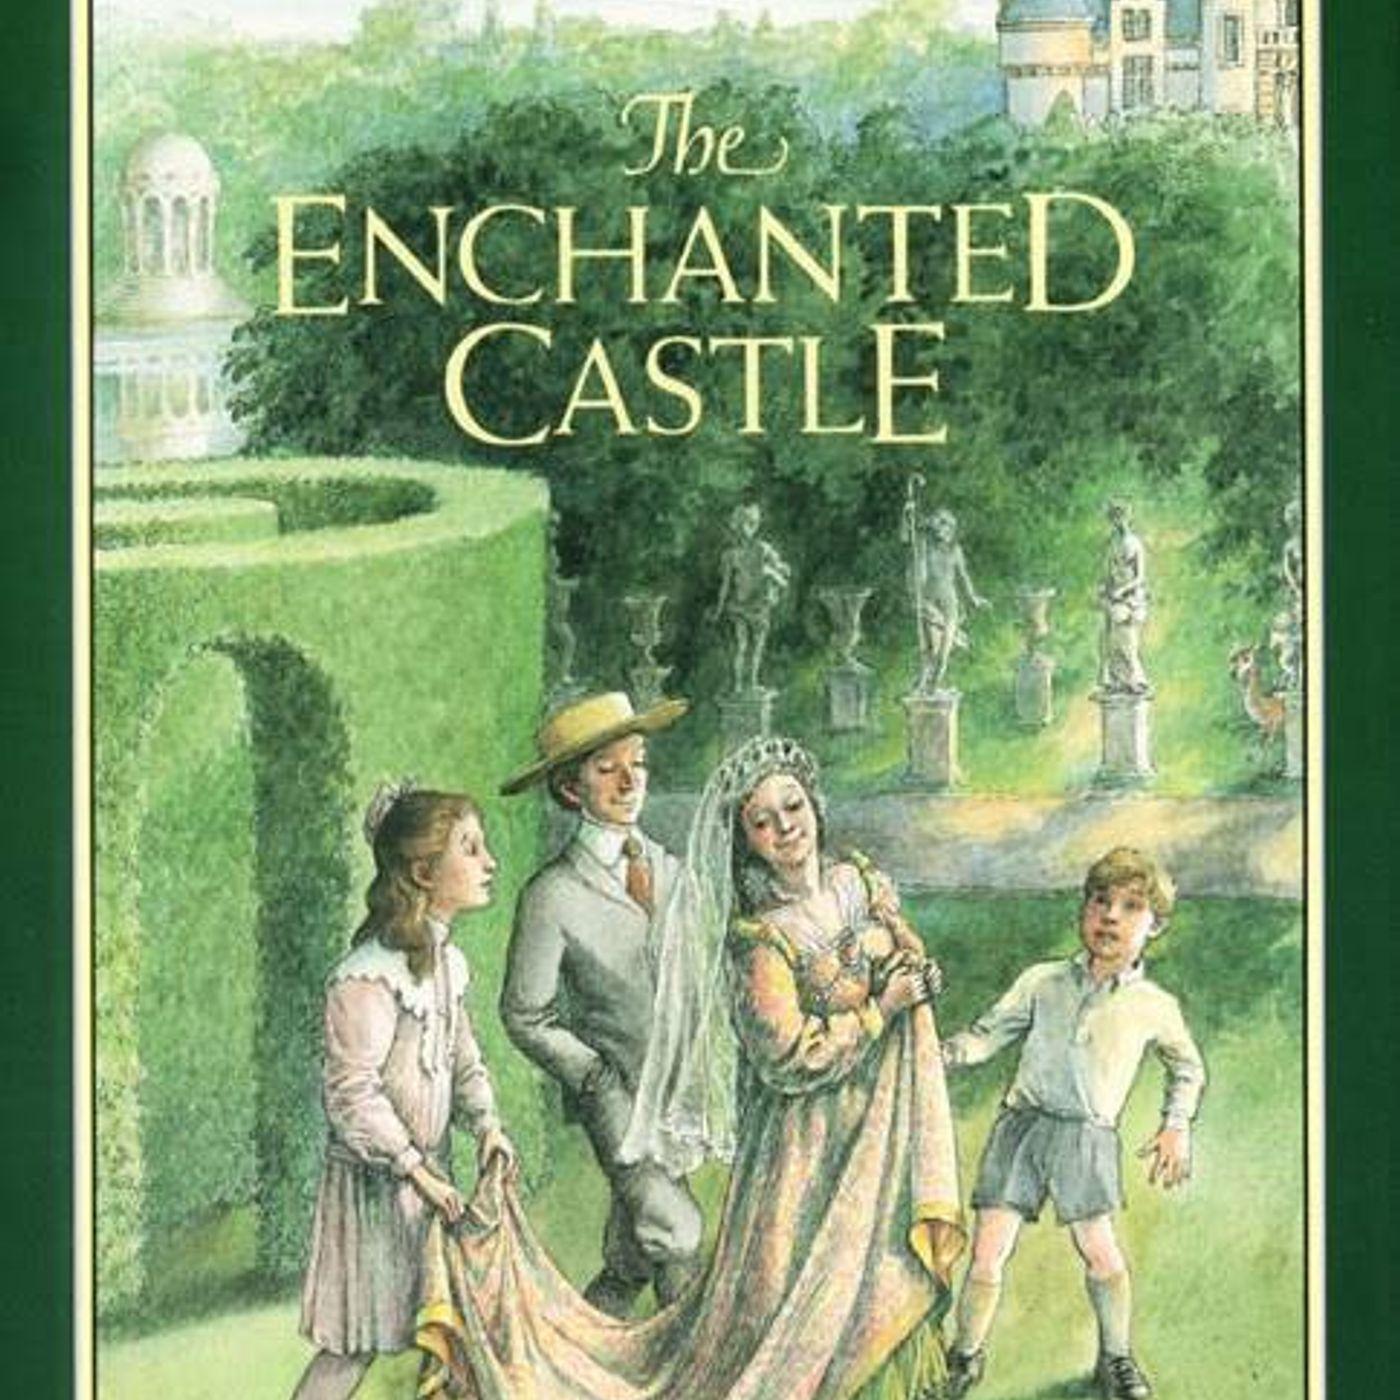 Childhood Favorites- The Enchanted Castle